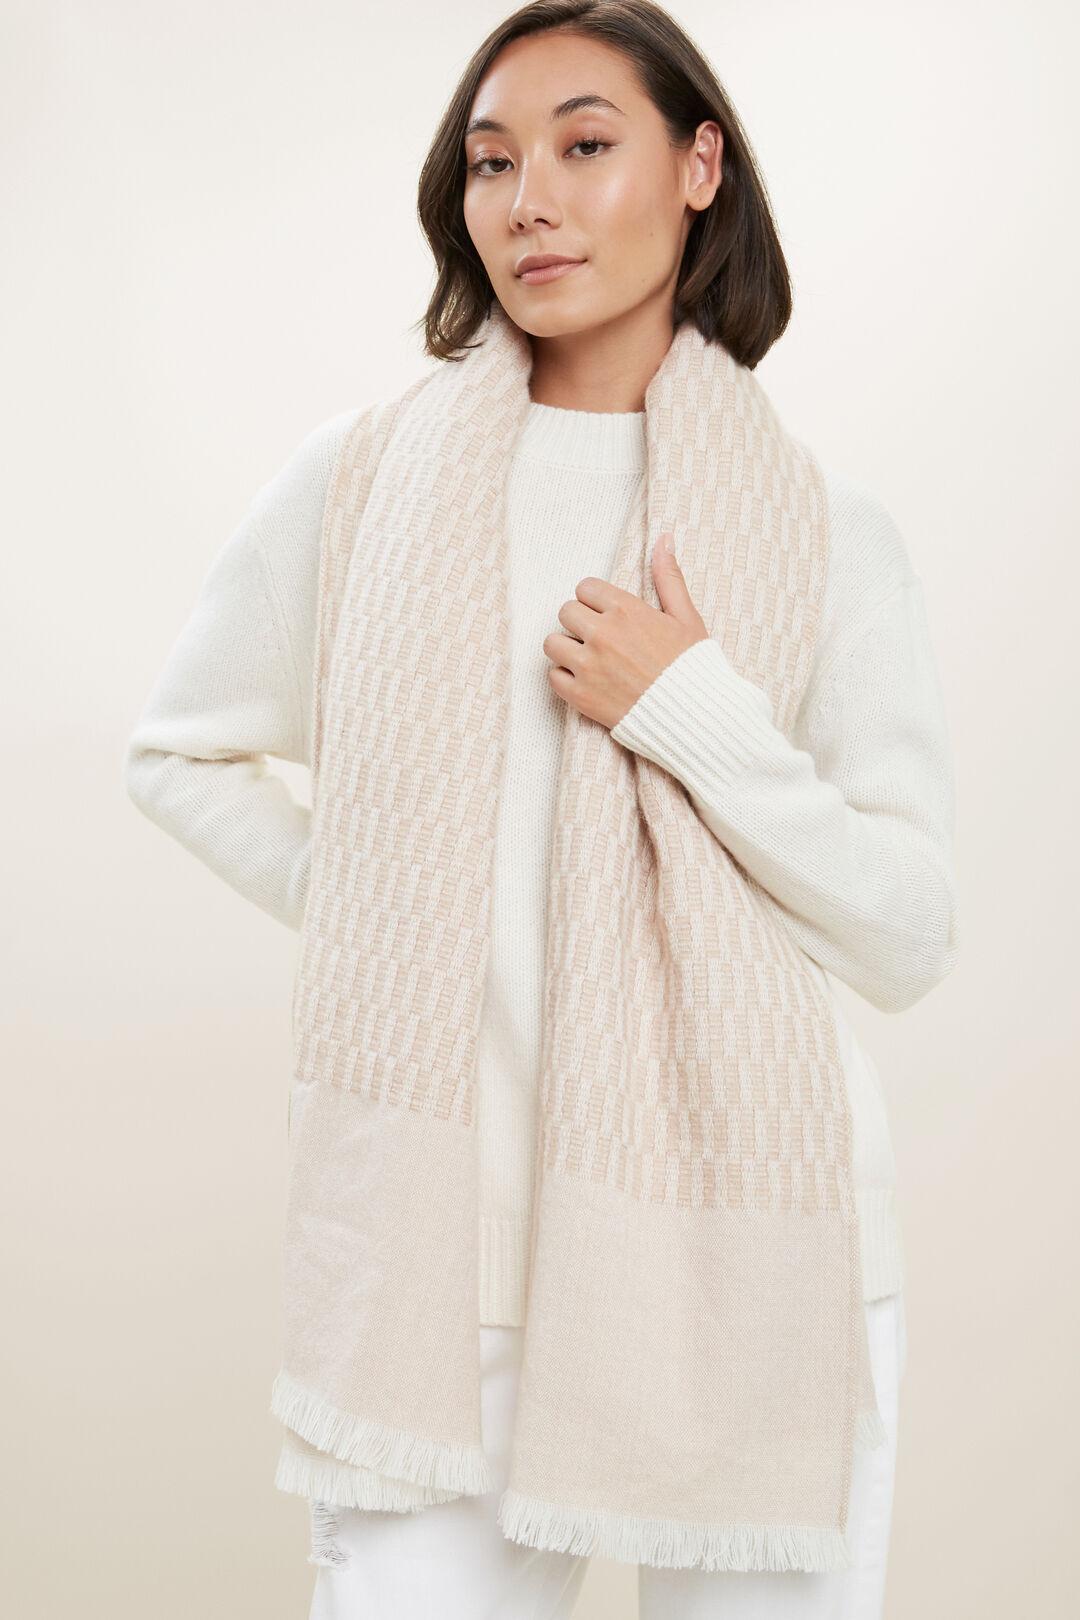 Wool Blend Scarf  CHAMPAGNE BEIGE MLTI  hi-res